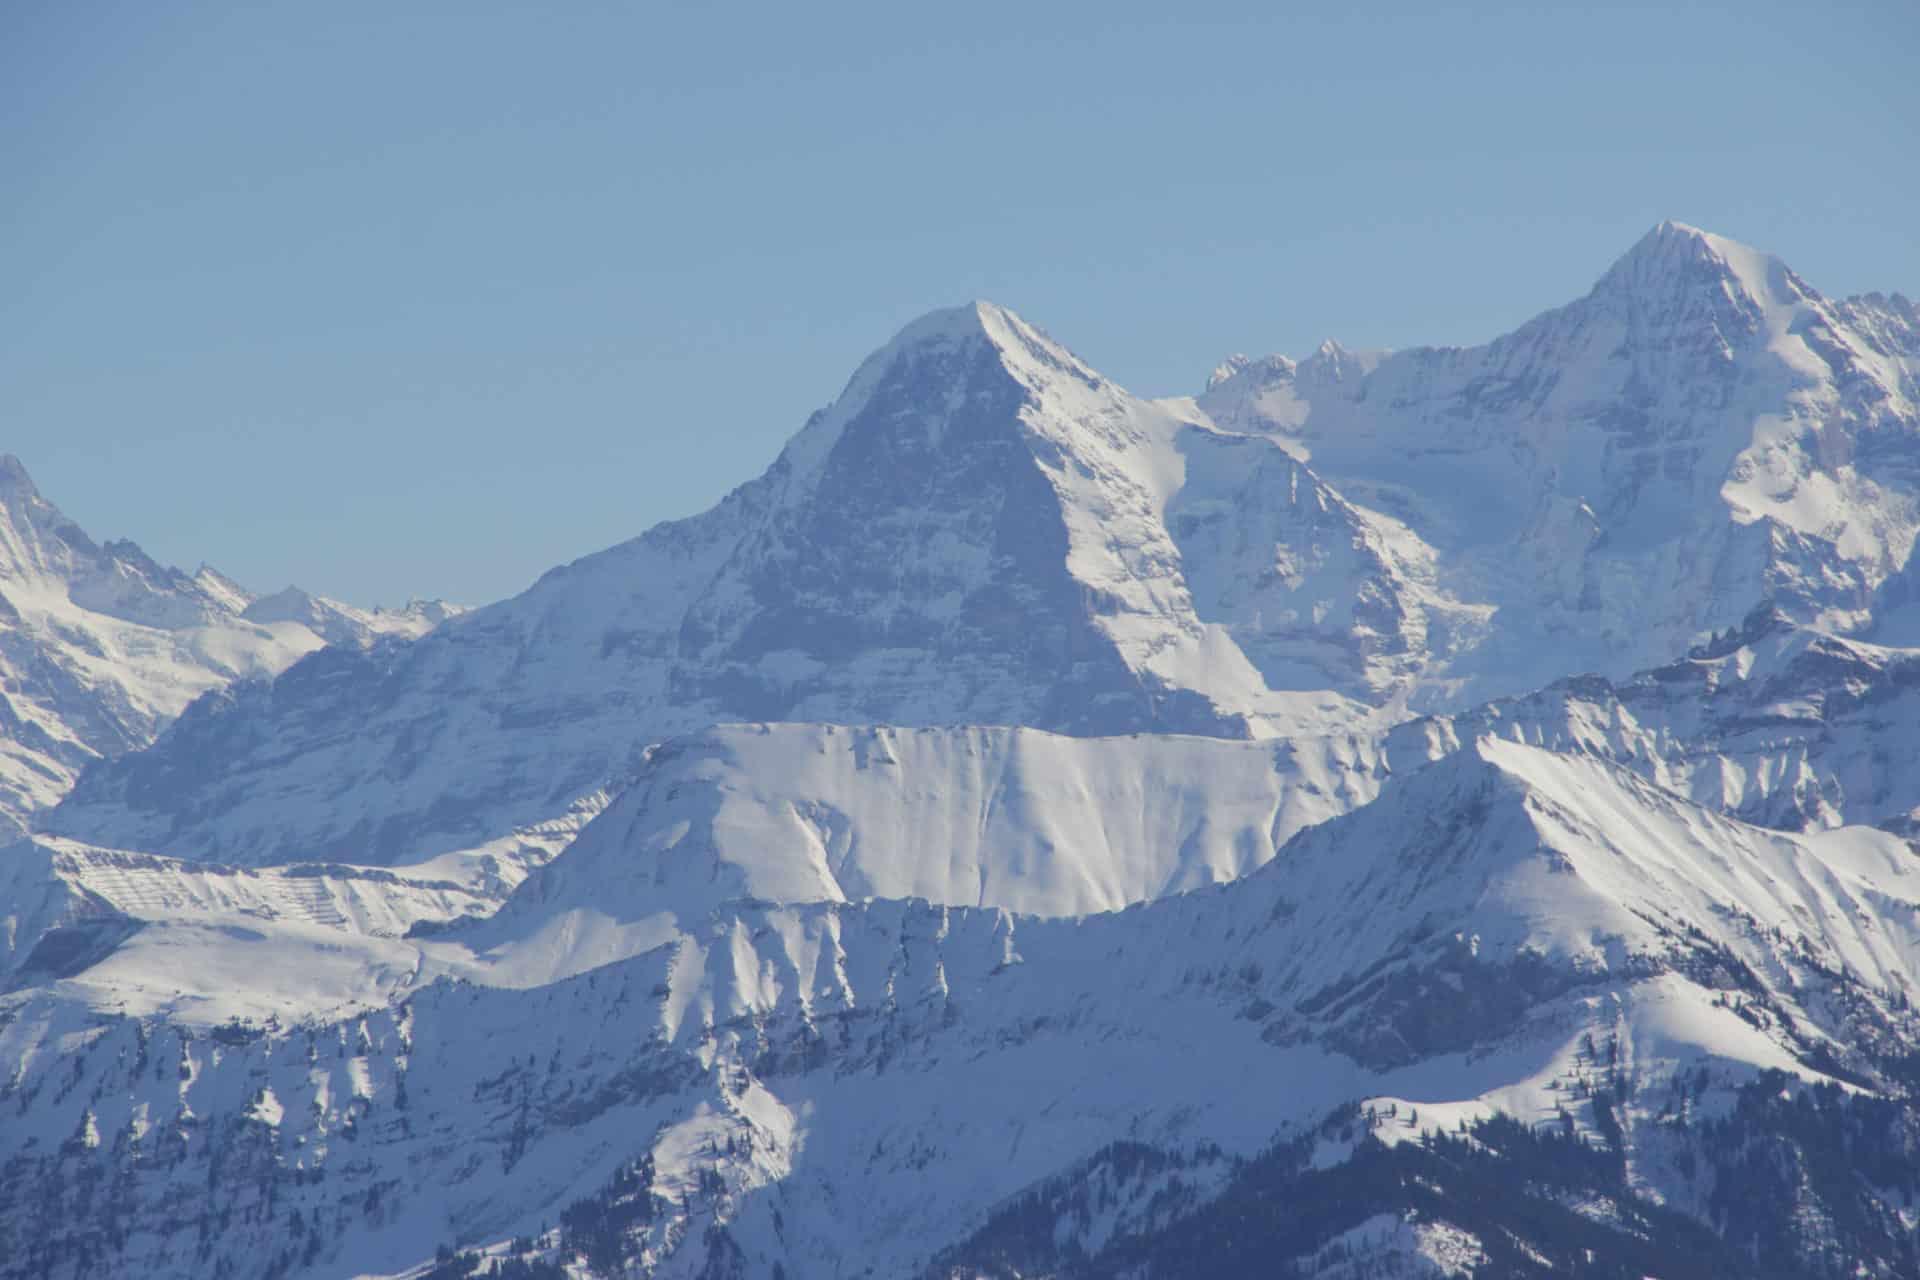 Climbing Mount Eiger, Mittellegi ridge